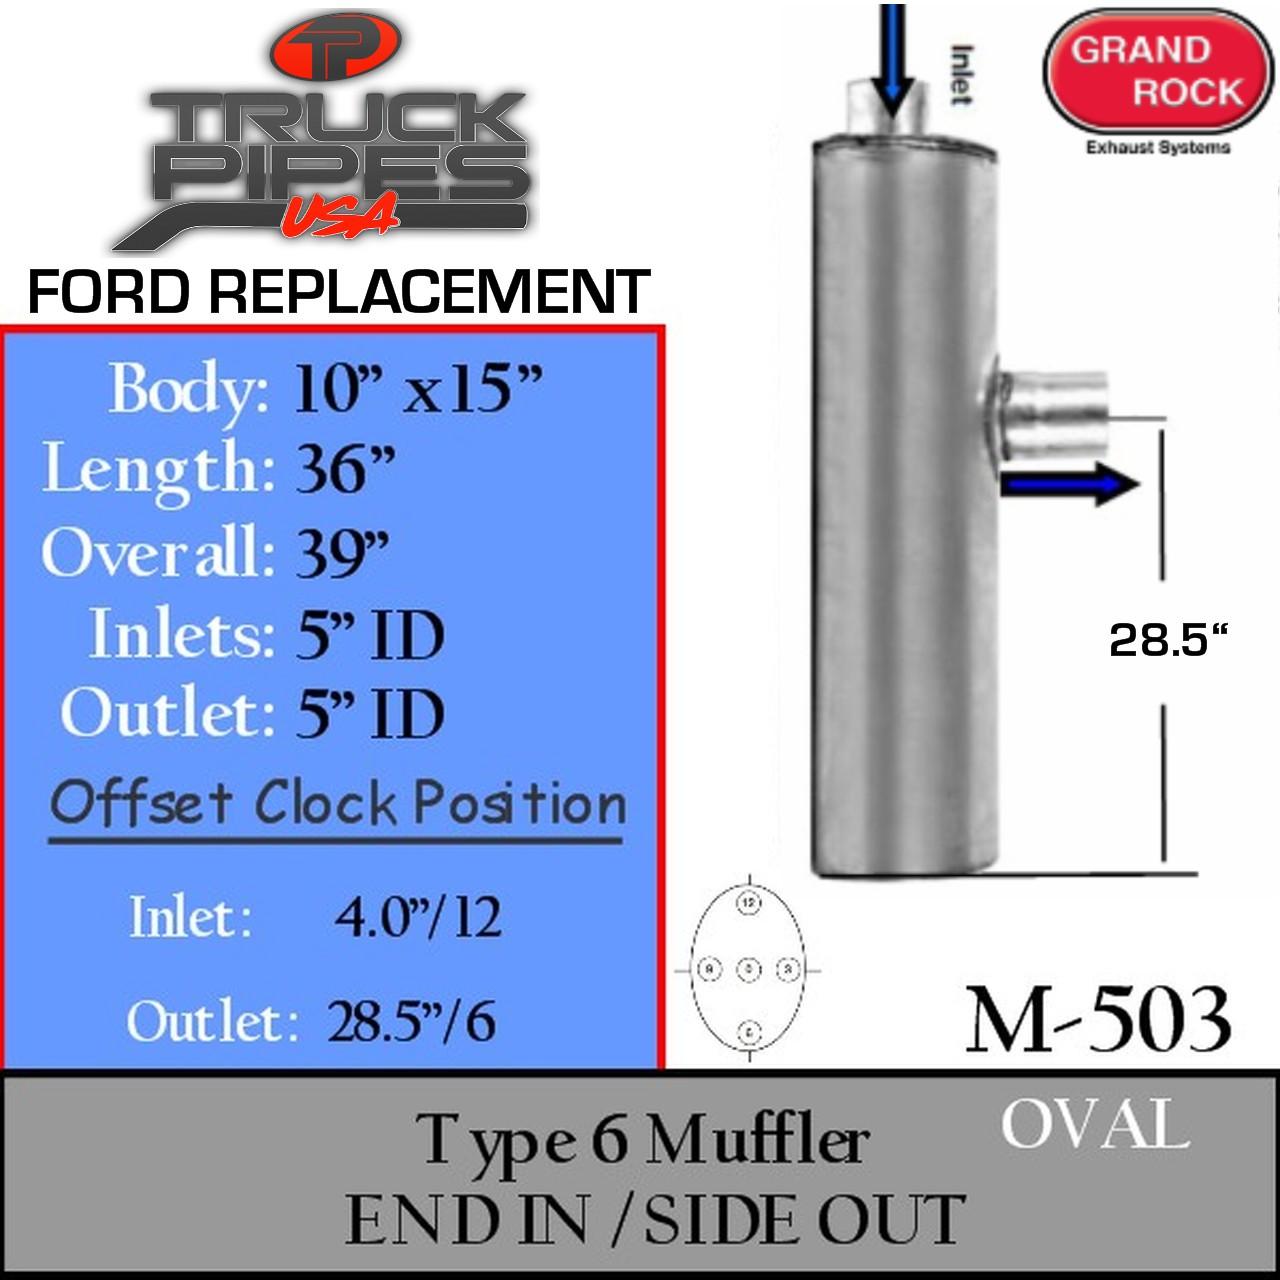 m-503-ford-truck-muffler-or-oval-diesel-big-rig-muffler-type6-end-in-side-out-pipe.jpg